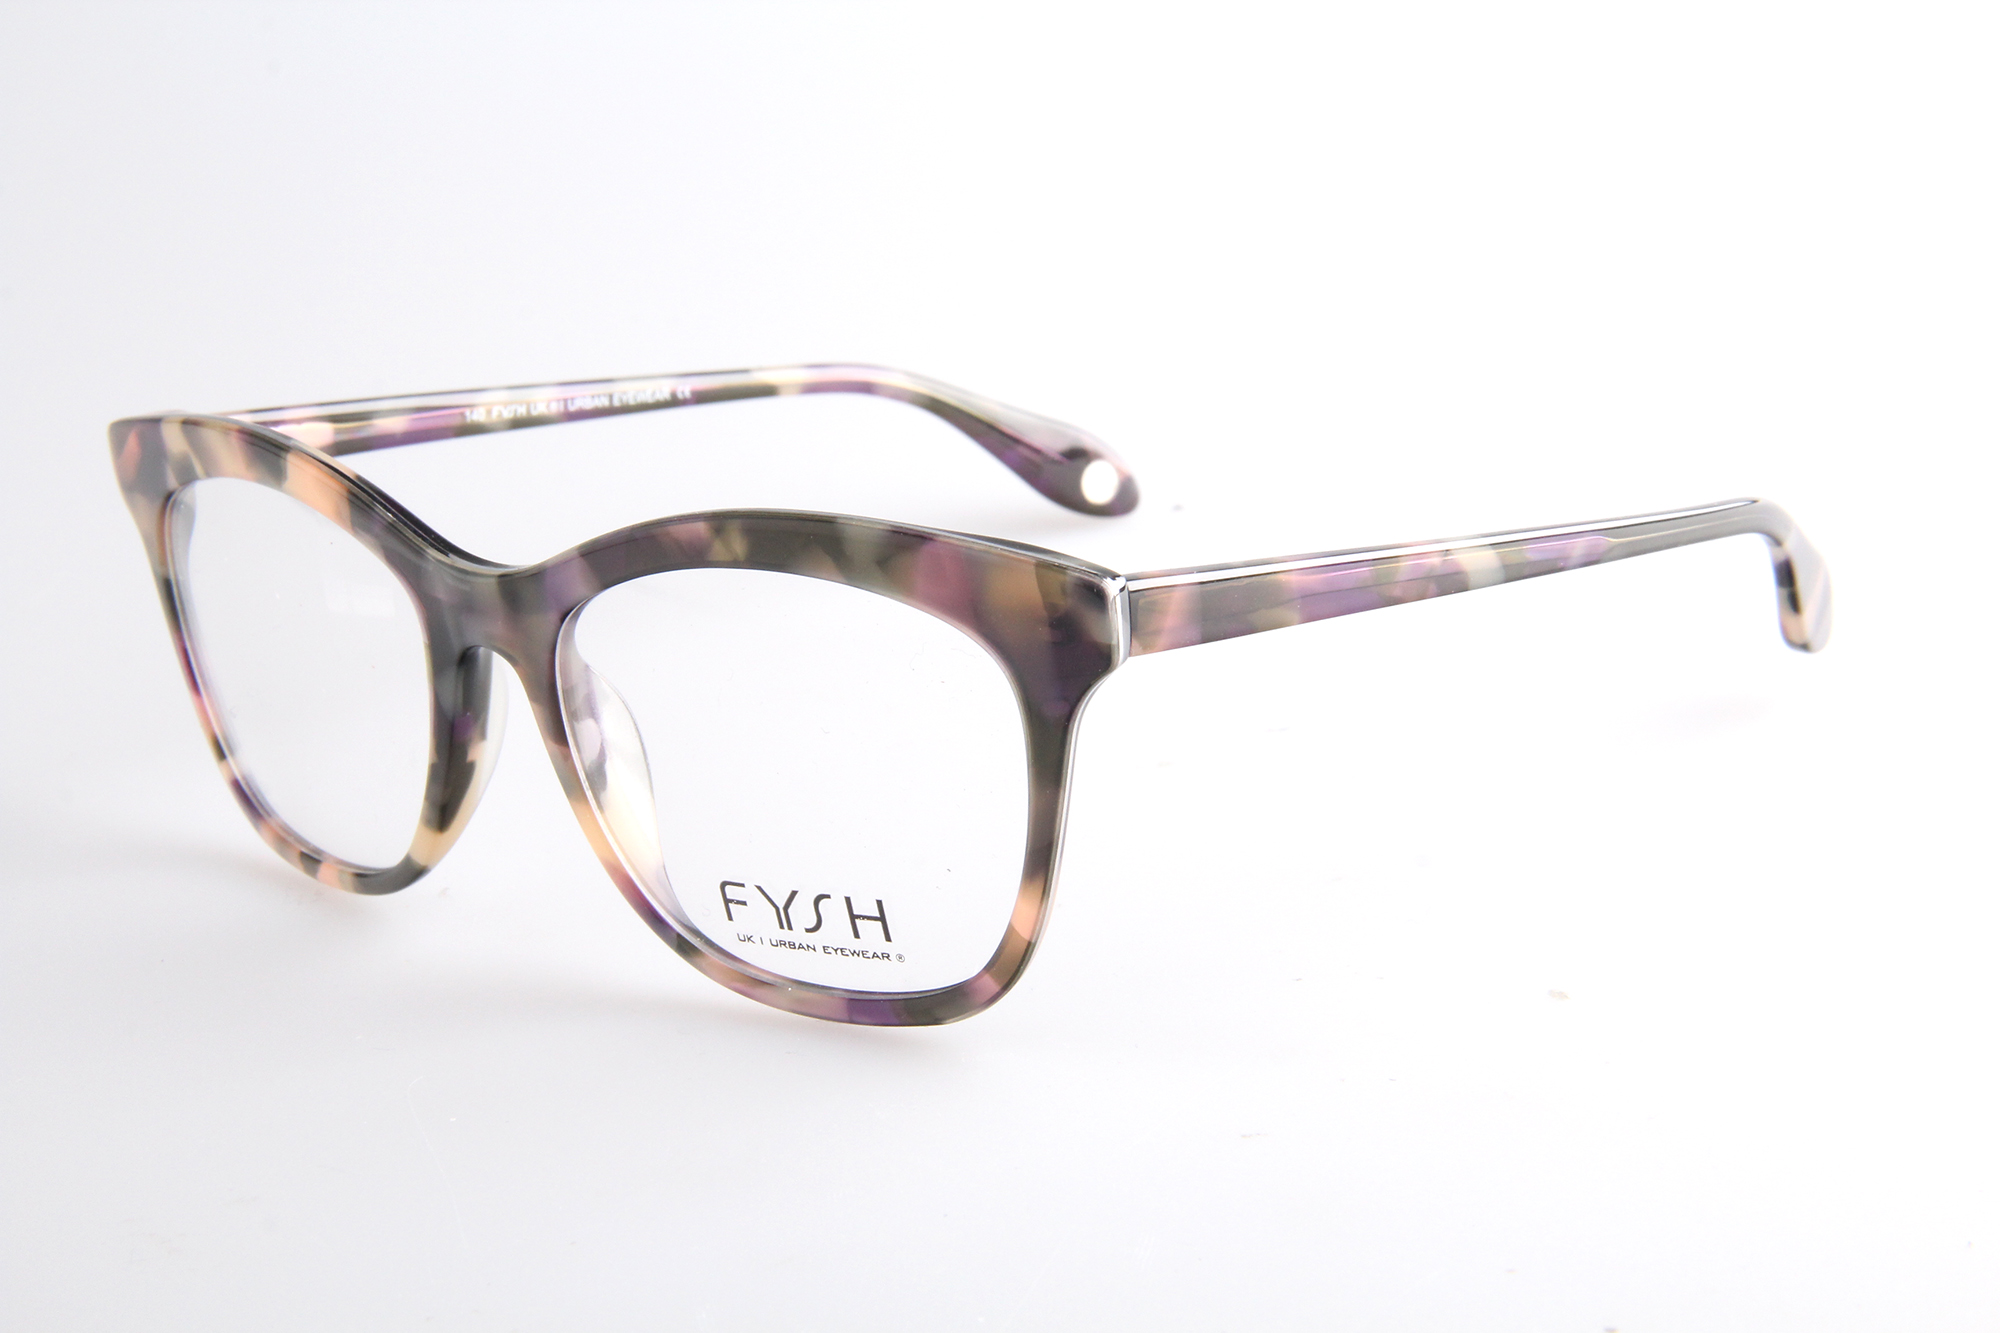 FY-3559-650